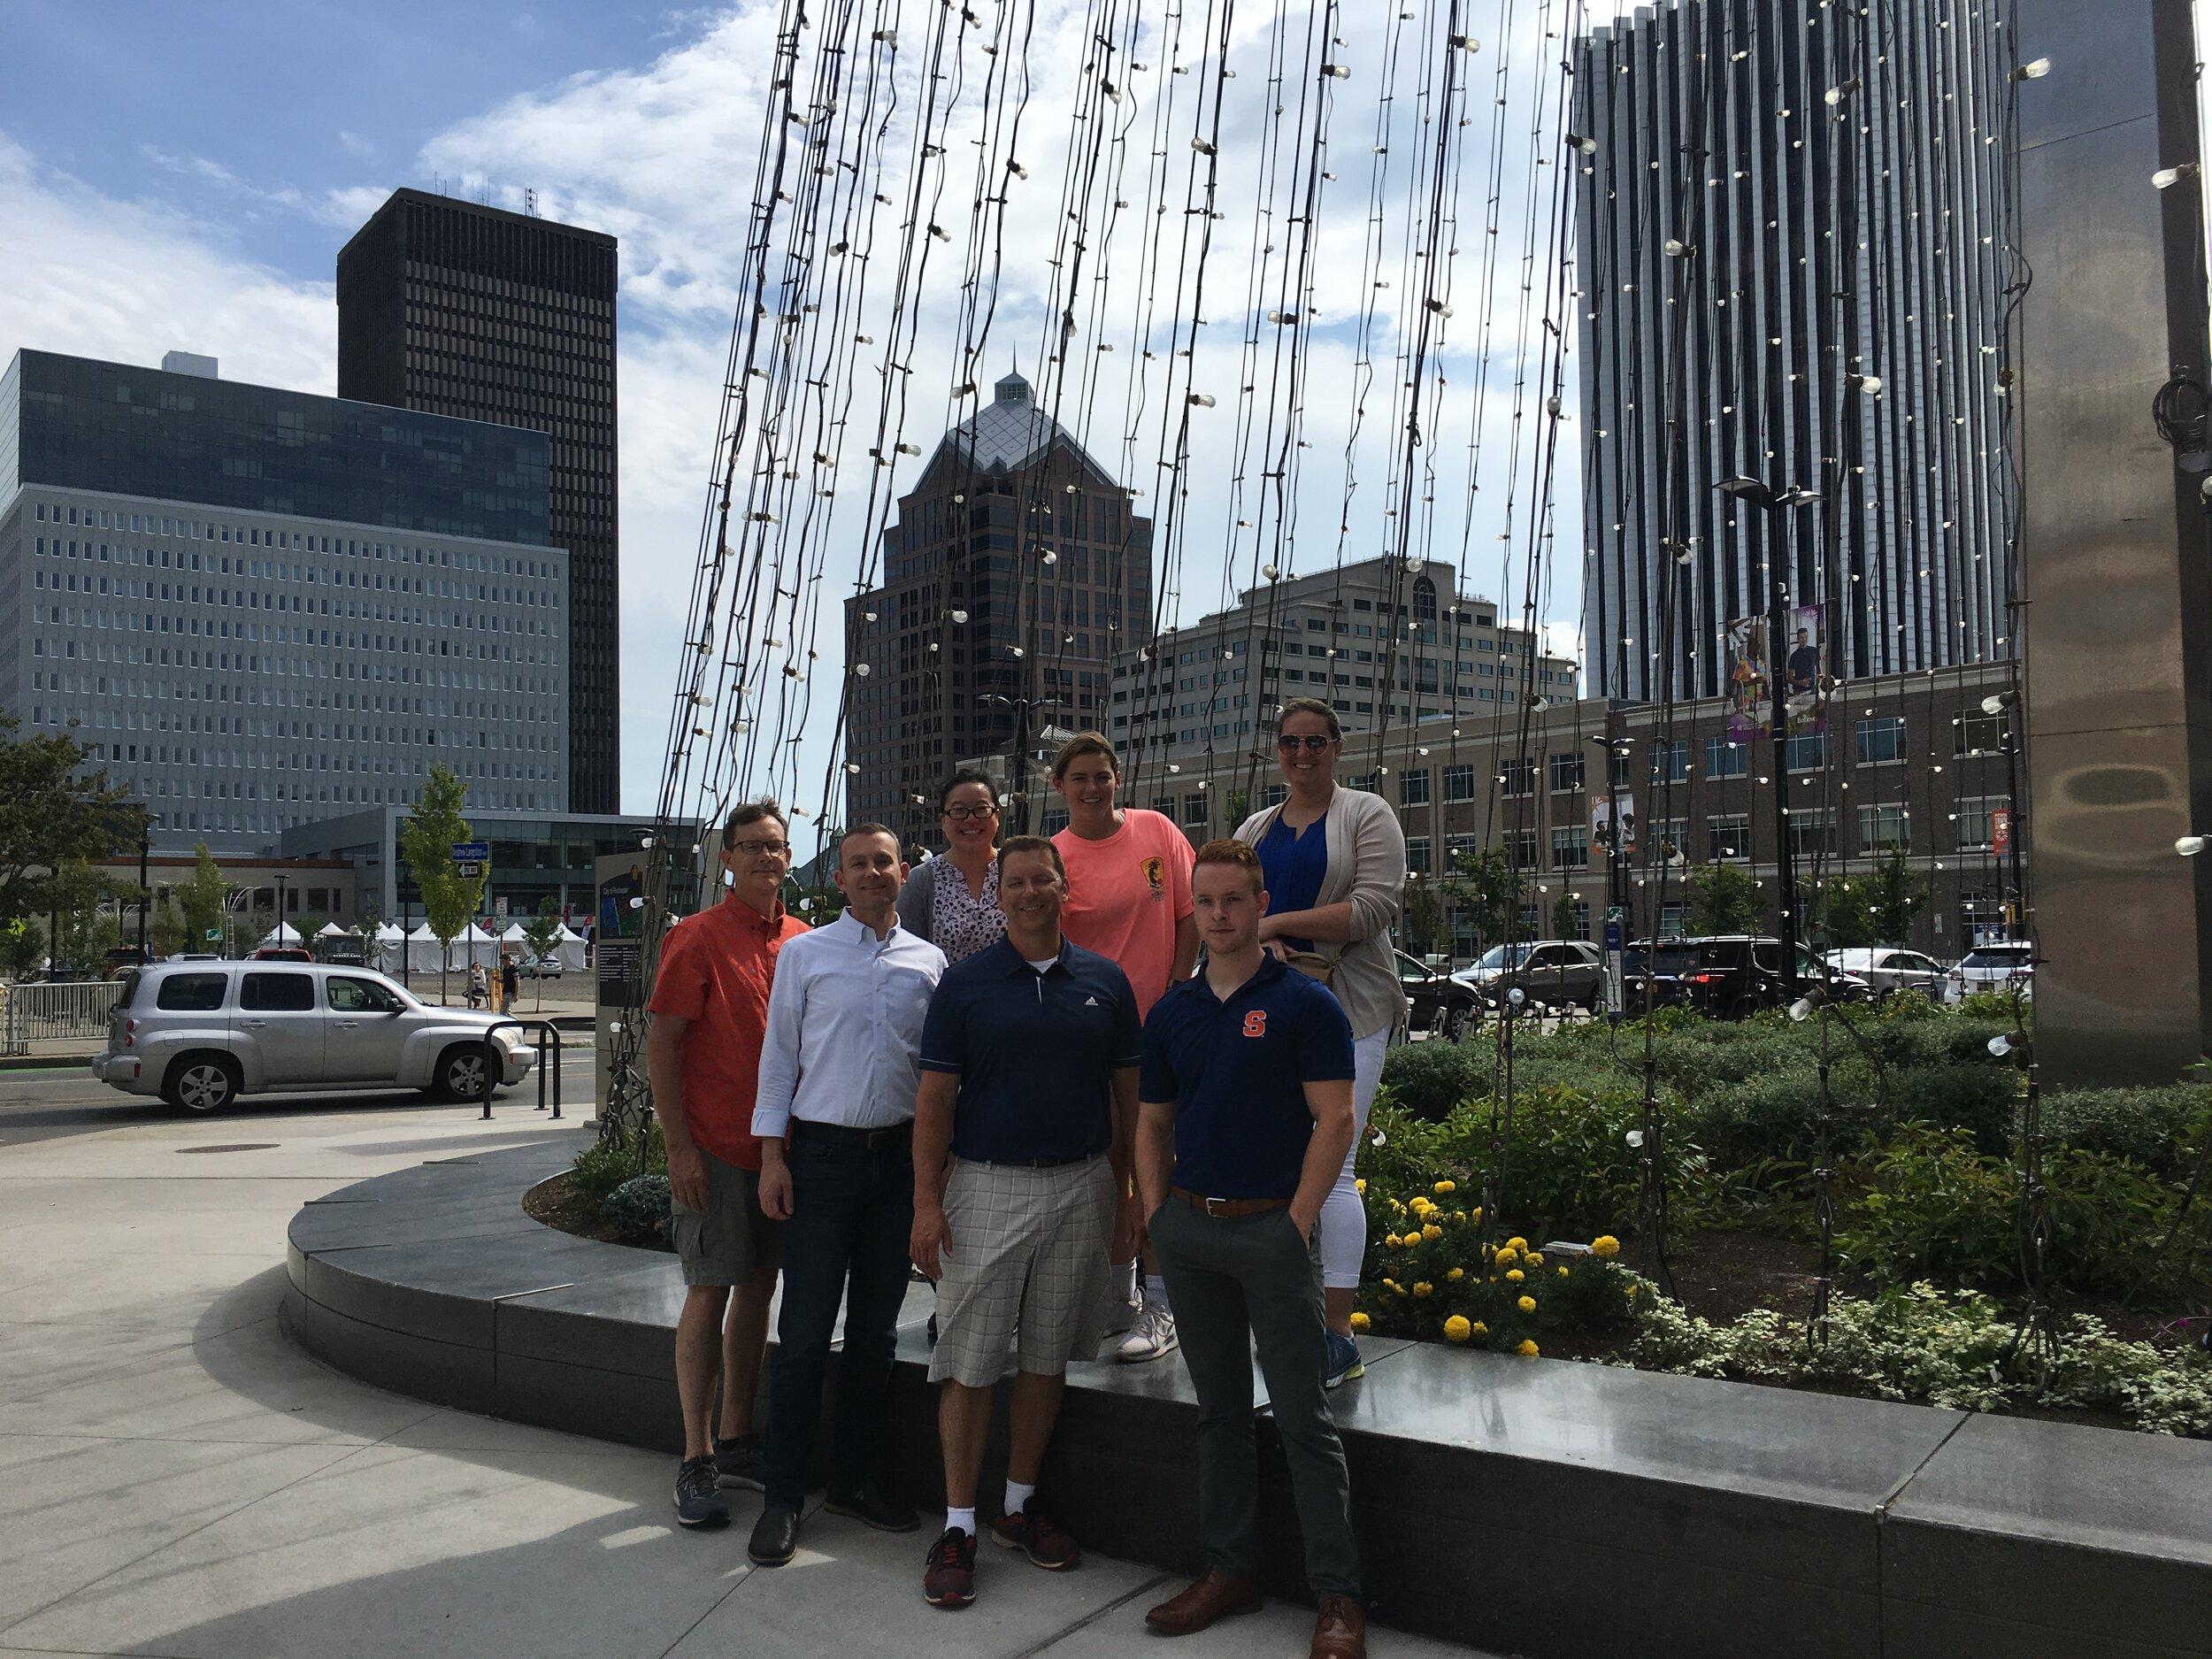 Liberty Pole, Parcel 5 & Rochester Savings Bank